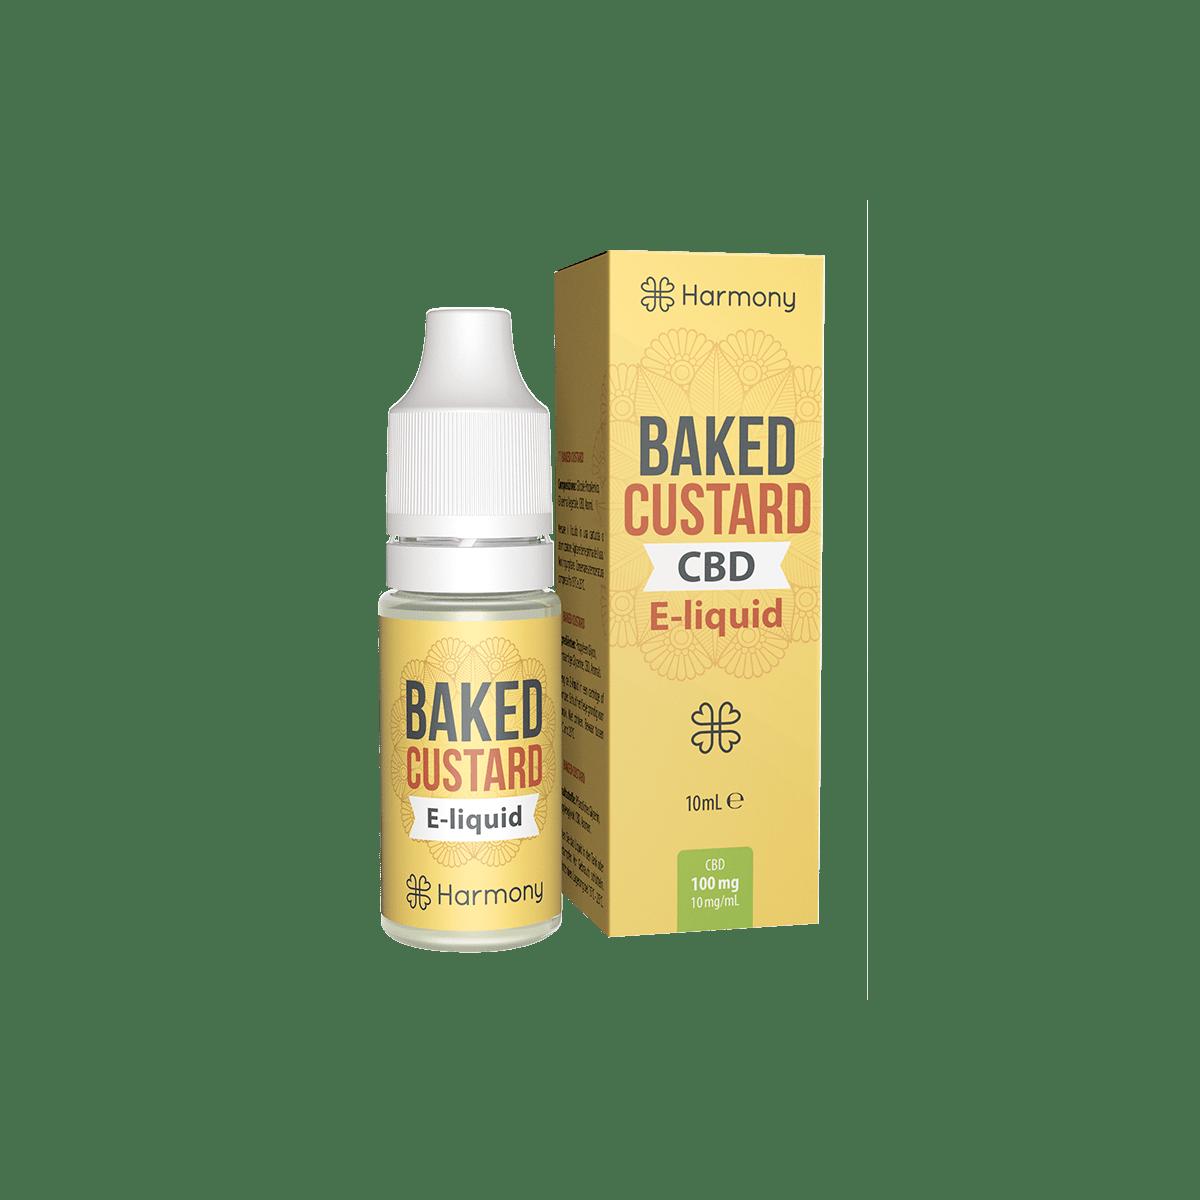 CBD Liquid | HARMONY - Baked Custard | Menge 10 ml - 100 mg im Preisvergleich